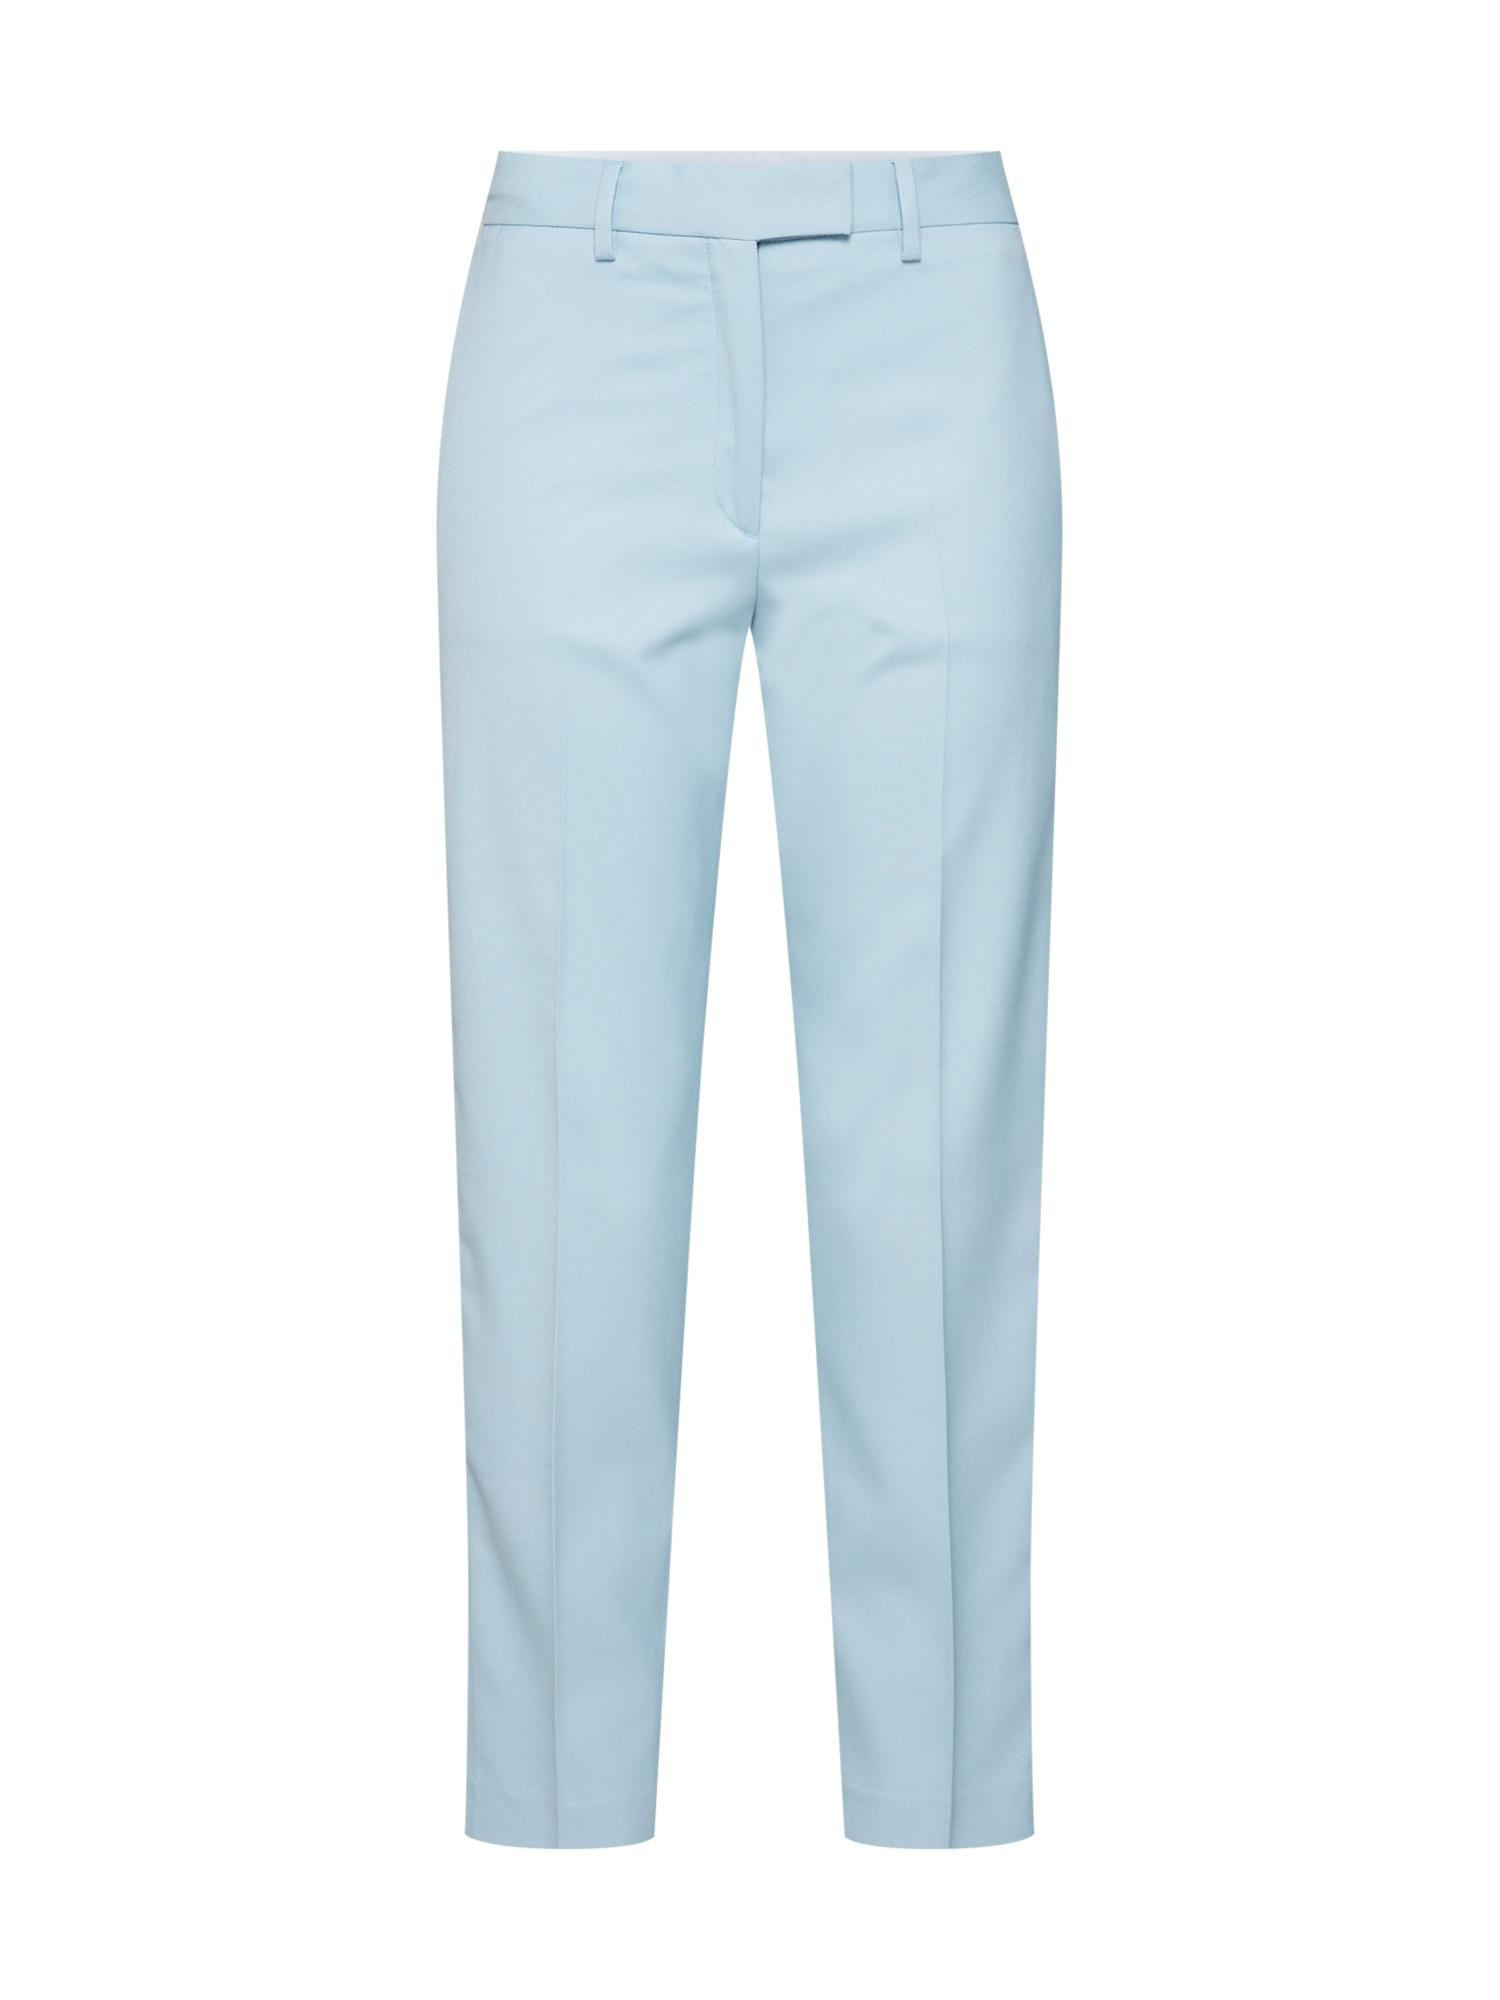 Kalhoty STP DETAIL PASTEL CIGARETTE PANT modrá Calvin Klein